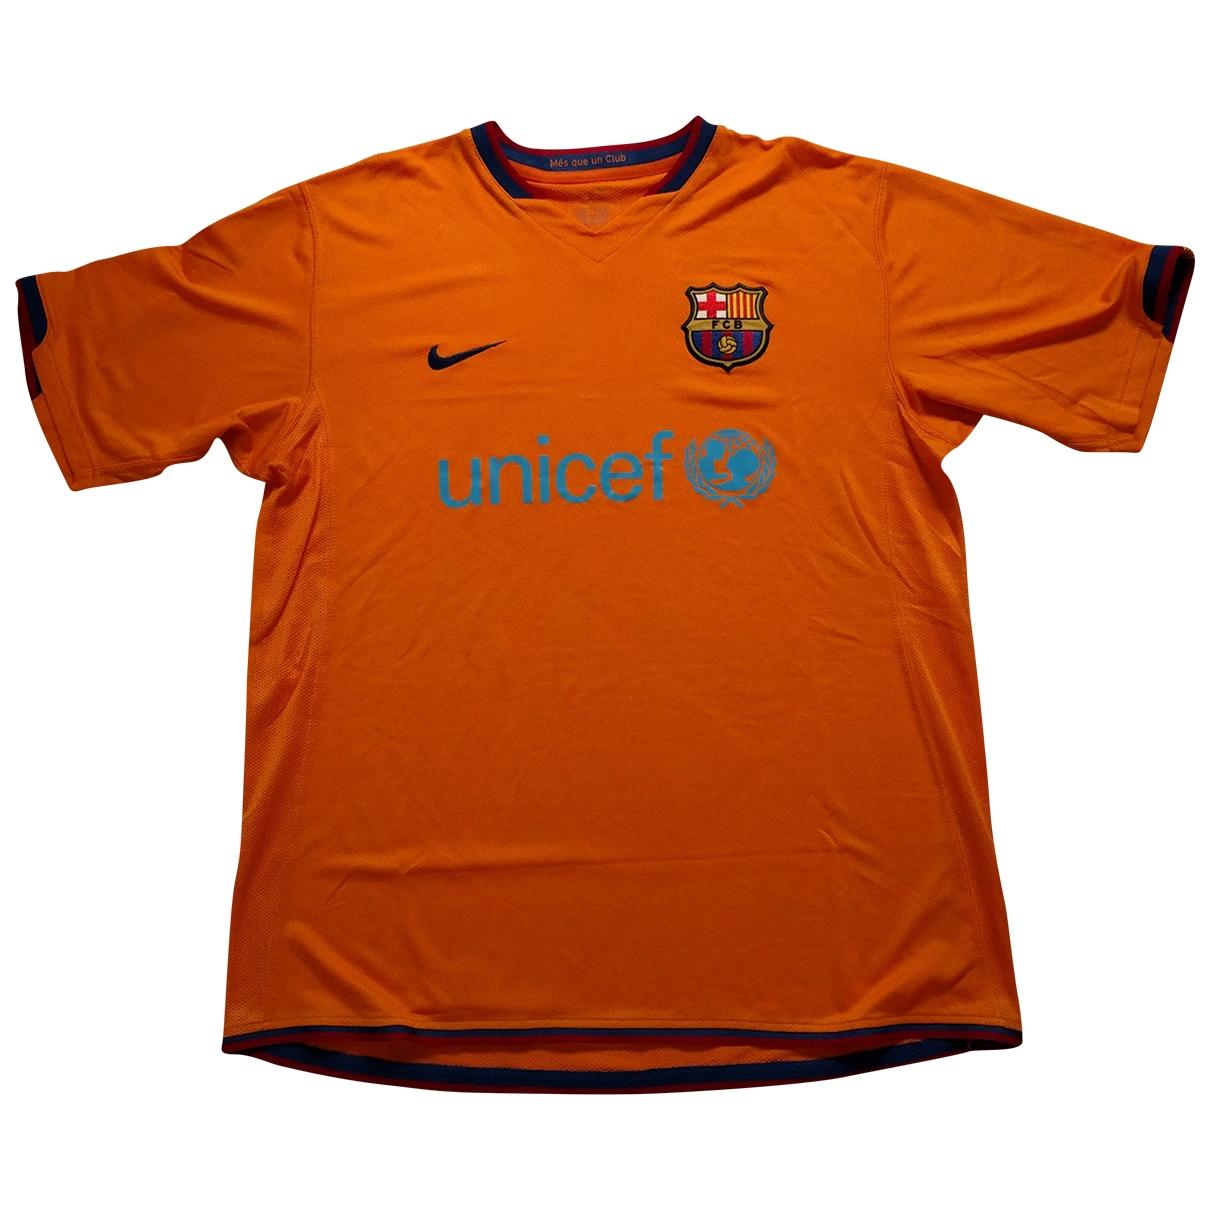 Nike \N Orange T-shirts for Men L International